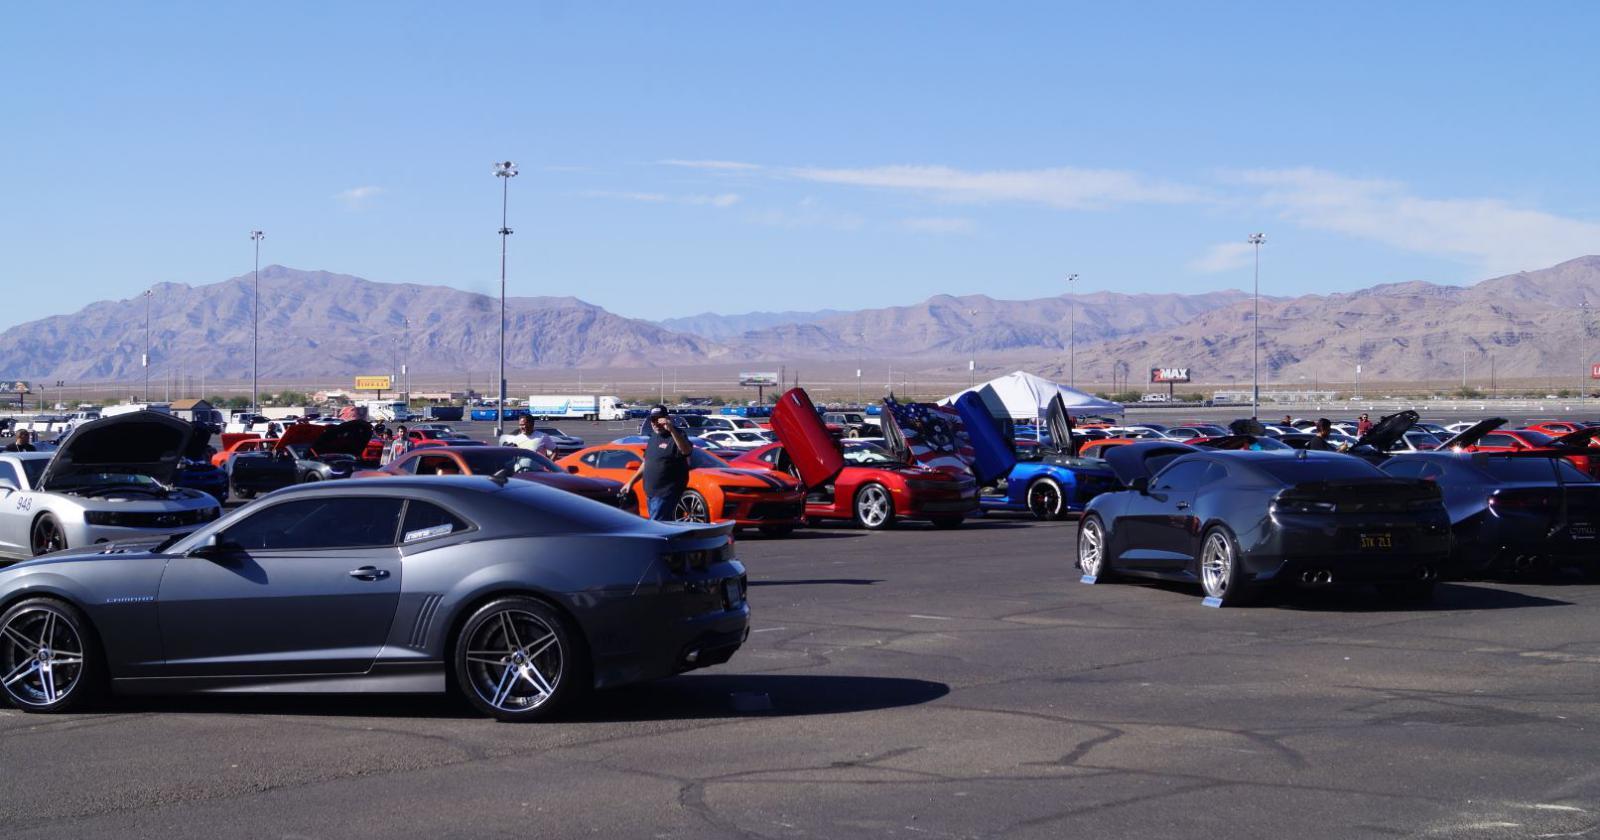 Name:  parking lot 1.jpg Views: 183 Size:  137.7 KB